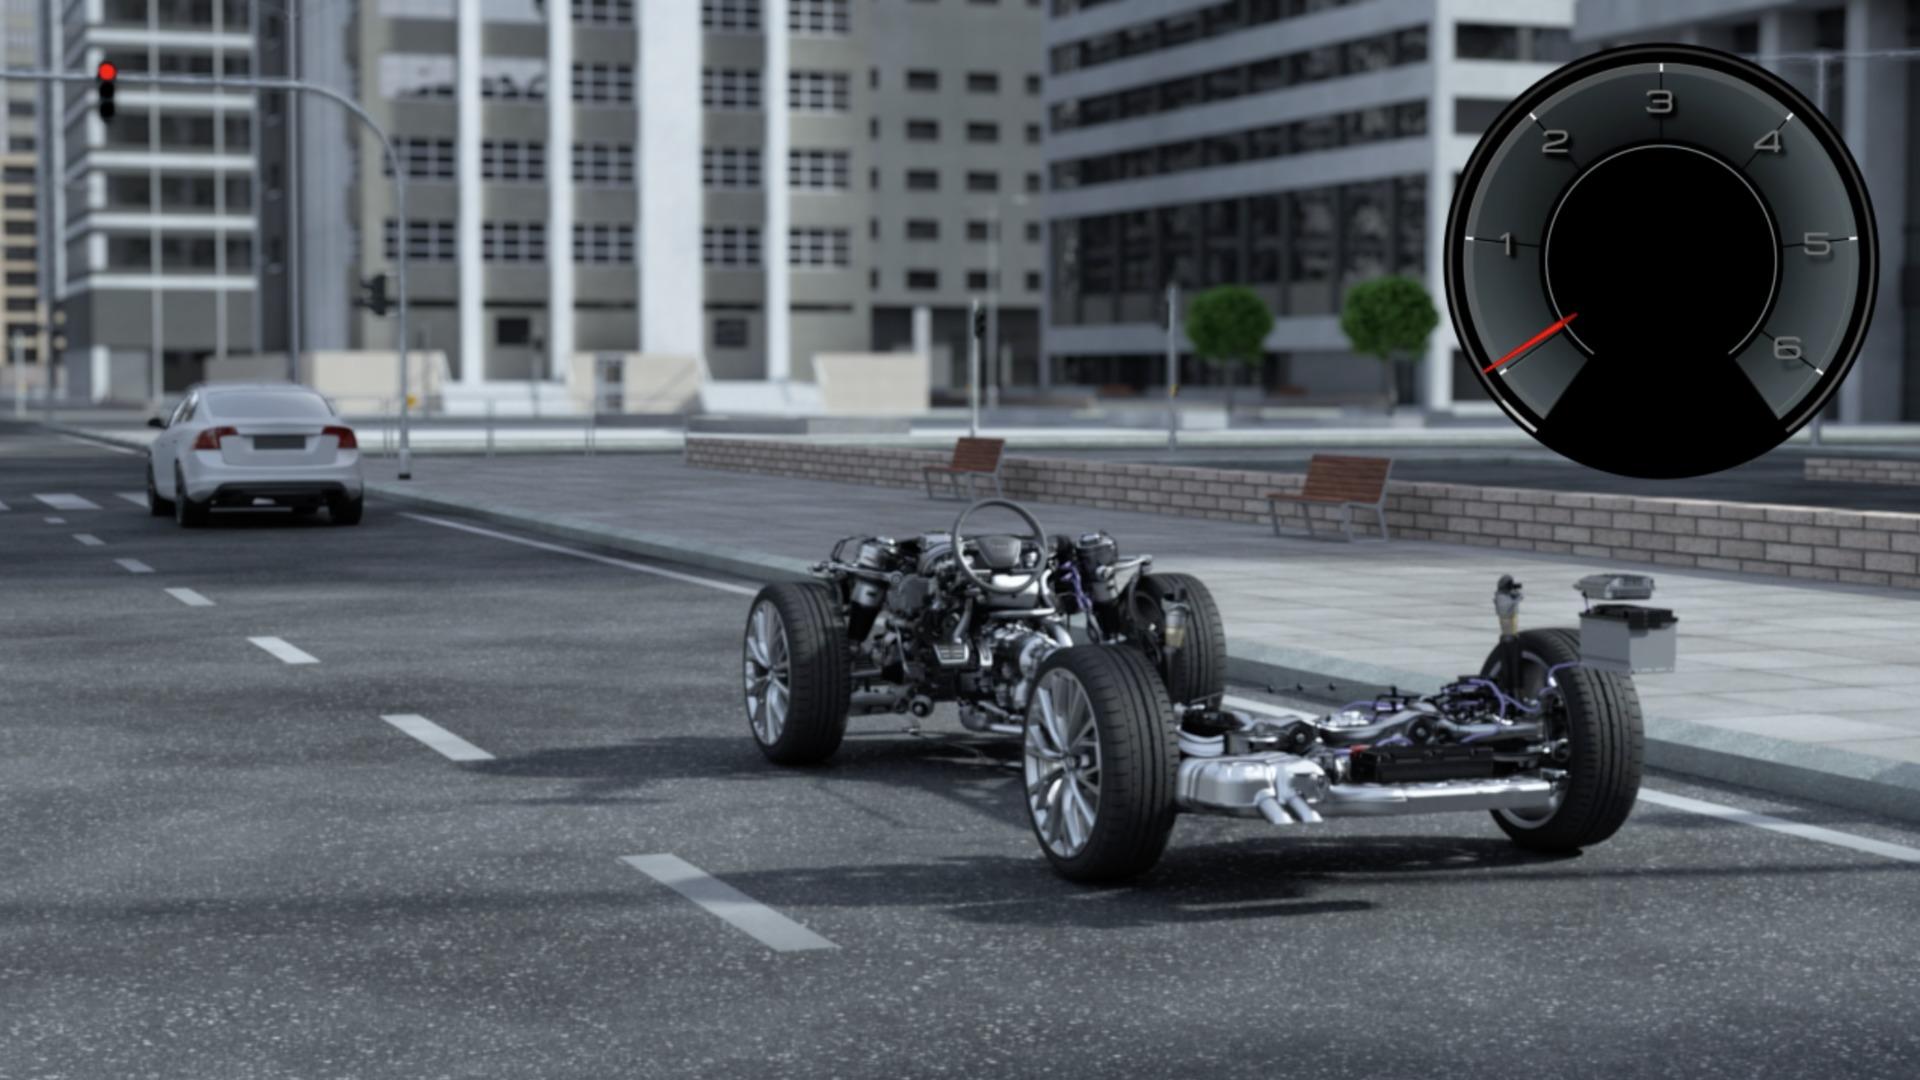 Audi A6 Avant Animation mild hybrid technology MHEV